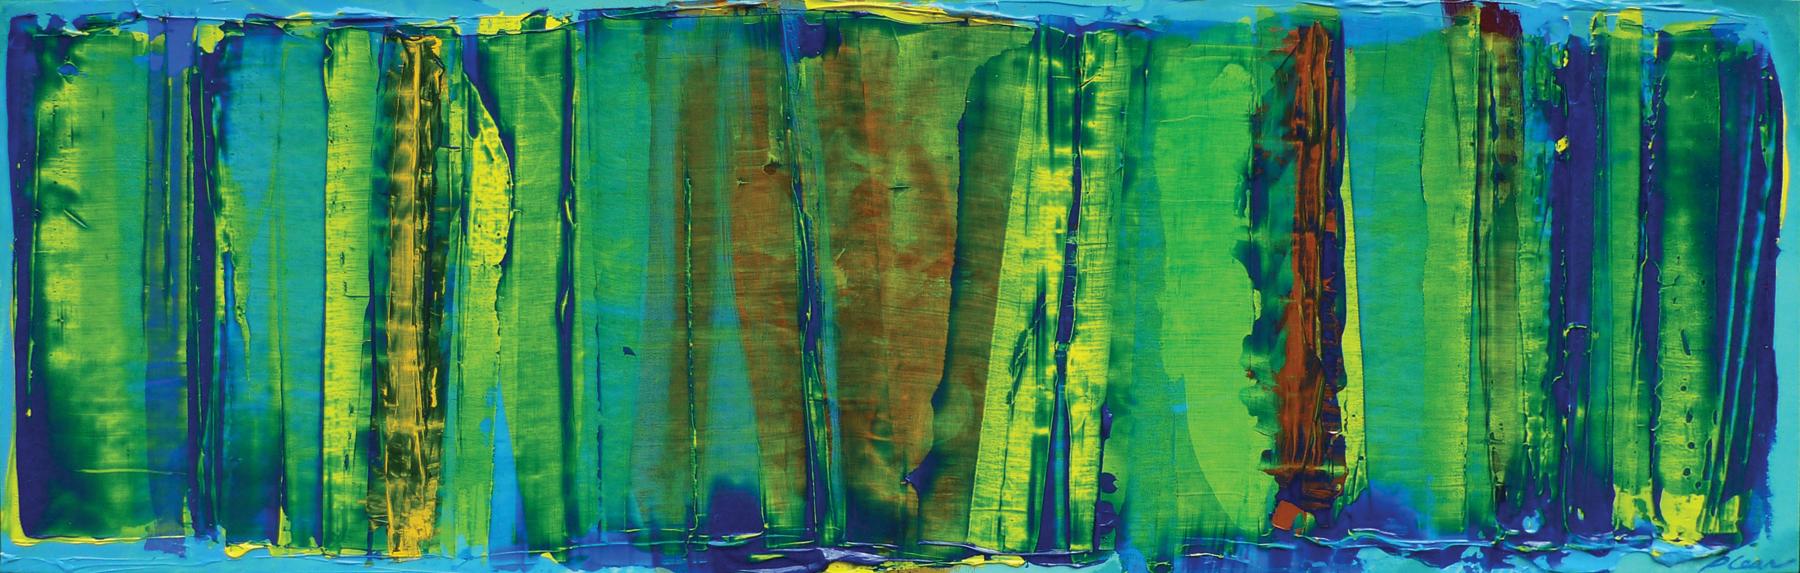 m12-arts-scott-plear-petrus-core